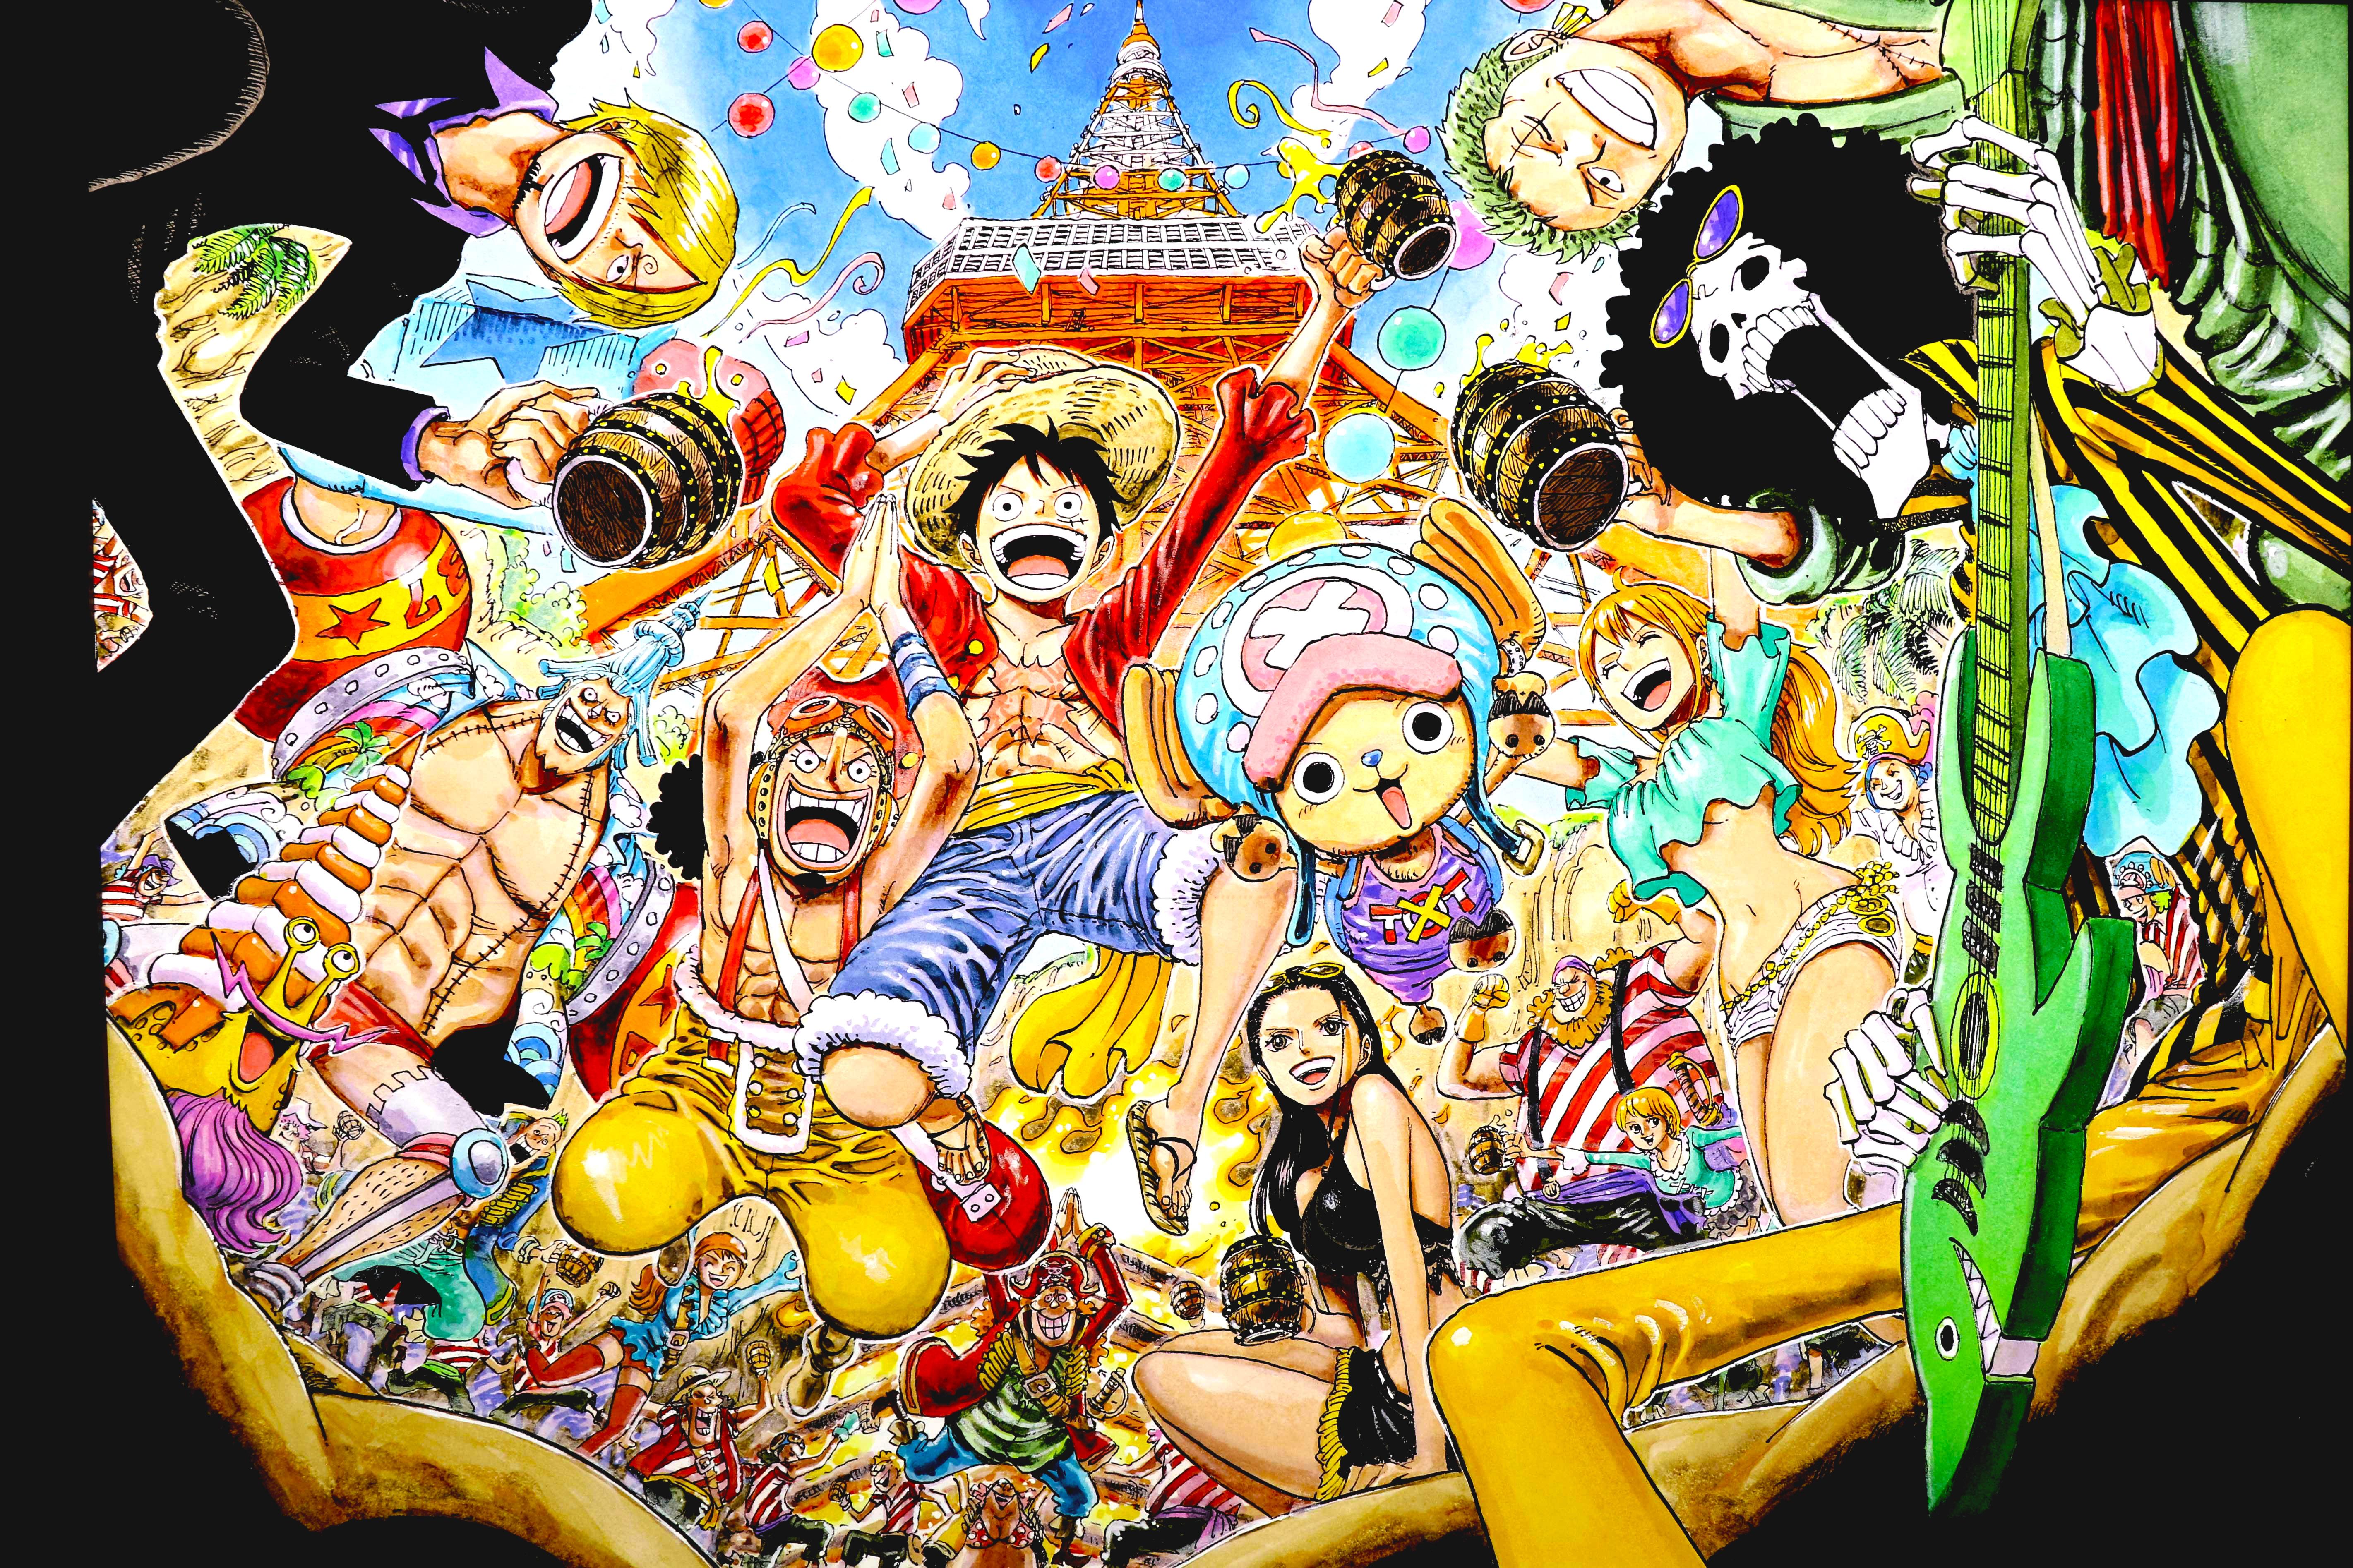 One Piece 5k Retina Ultra HD Wallpaper | Background Image | 5686x3790 | ID:971573 - Wallpaper Abyss